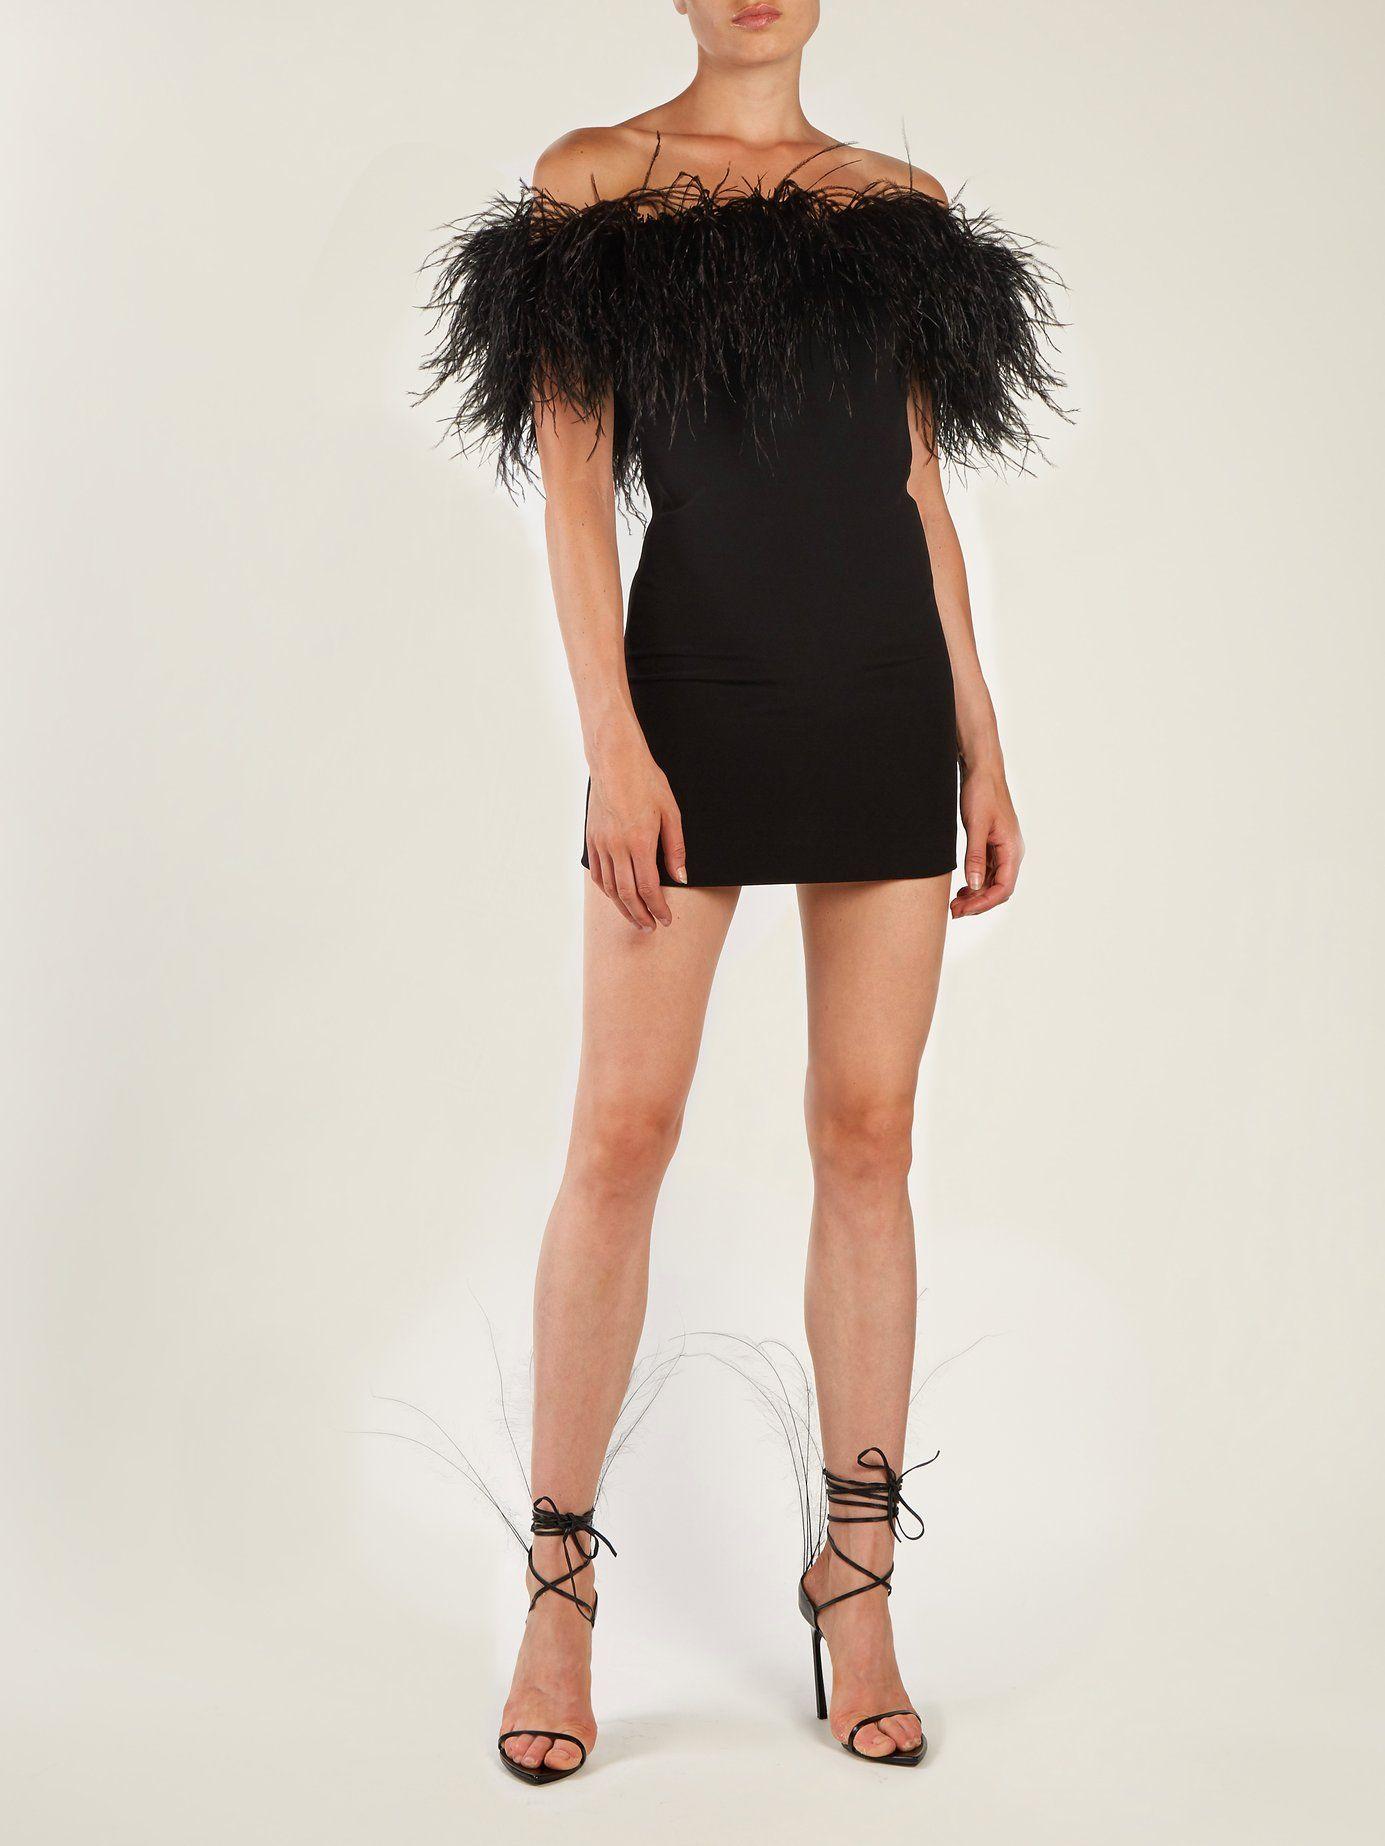 Off The Shoulder Ostrich Feather Trimmed Dress Saint Laurent Matchesfashion Com Us Feather Dress Short Feather Outfit Feather Dress [ 1846 x 1385 Pixel ]